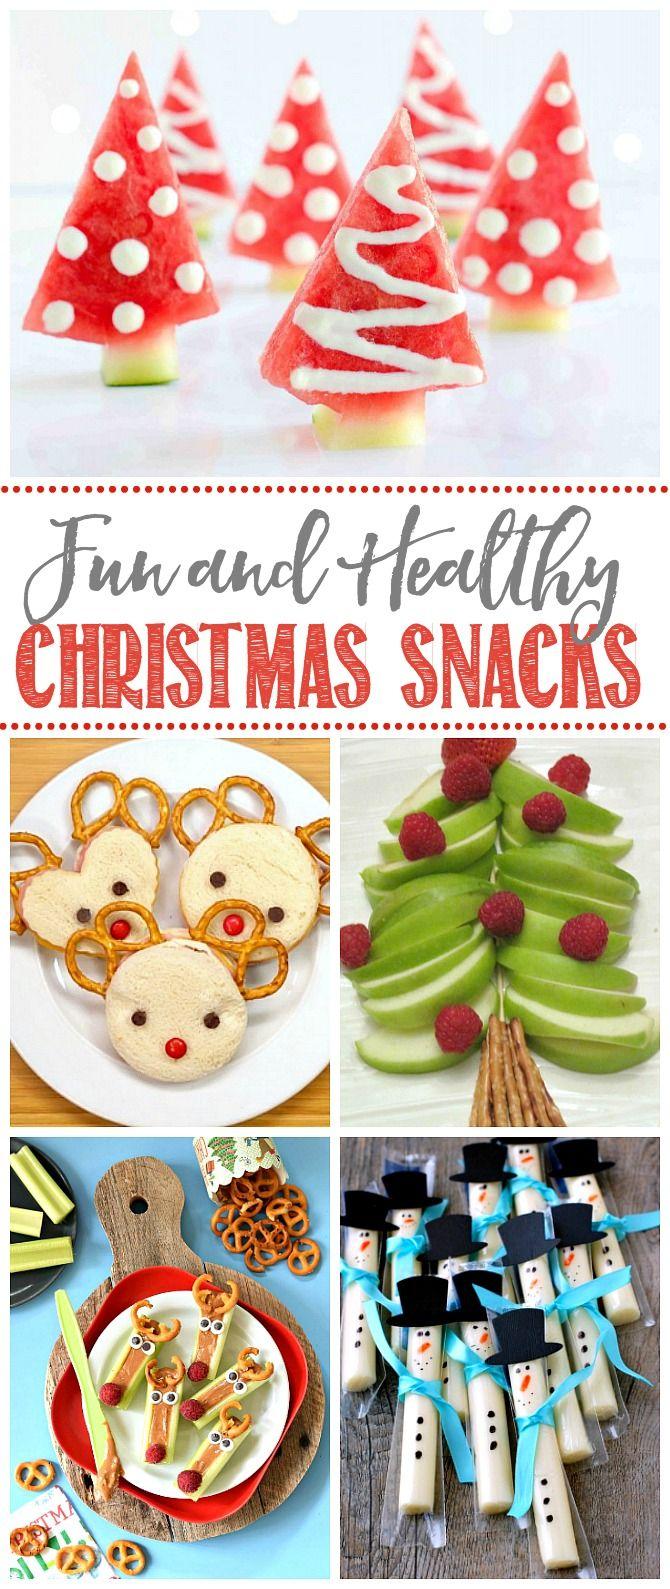 Healthy Christmas Snacks #holidaytreats